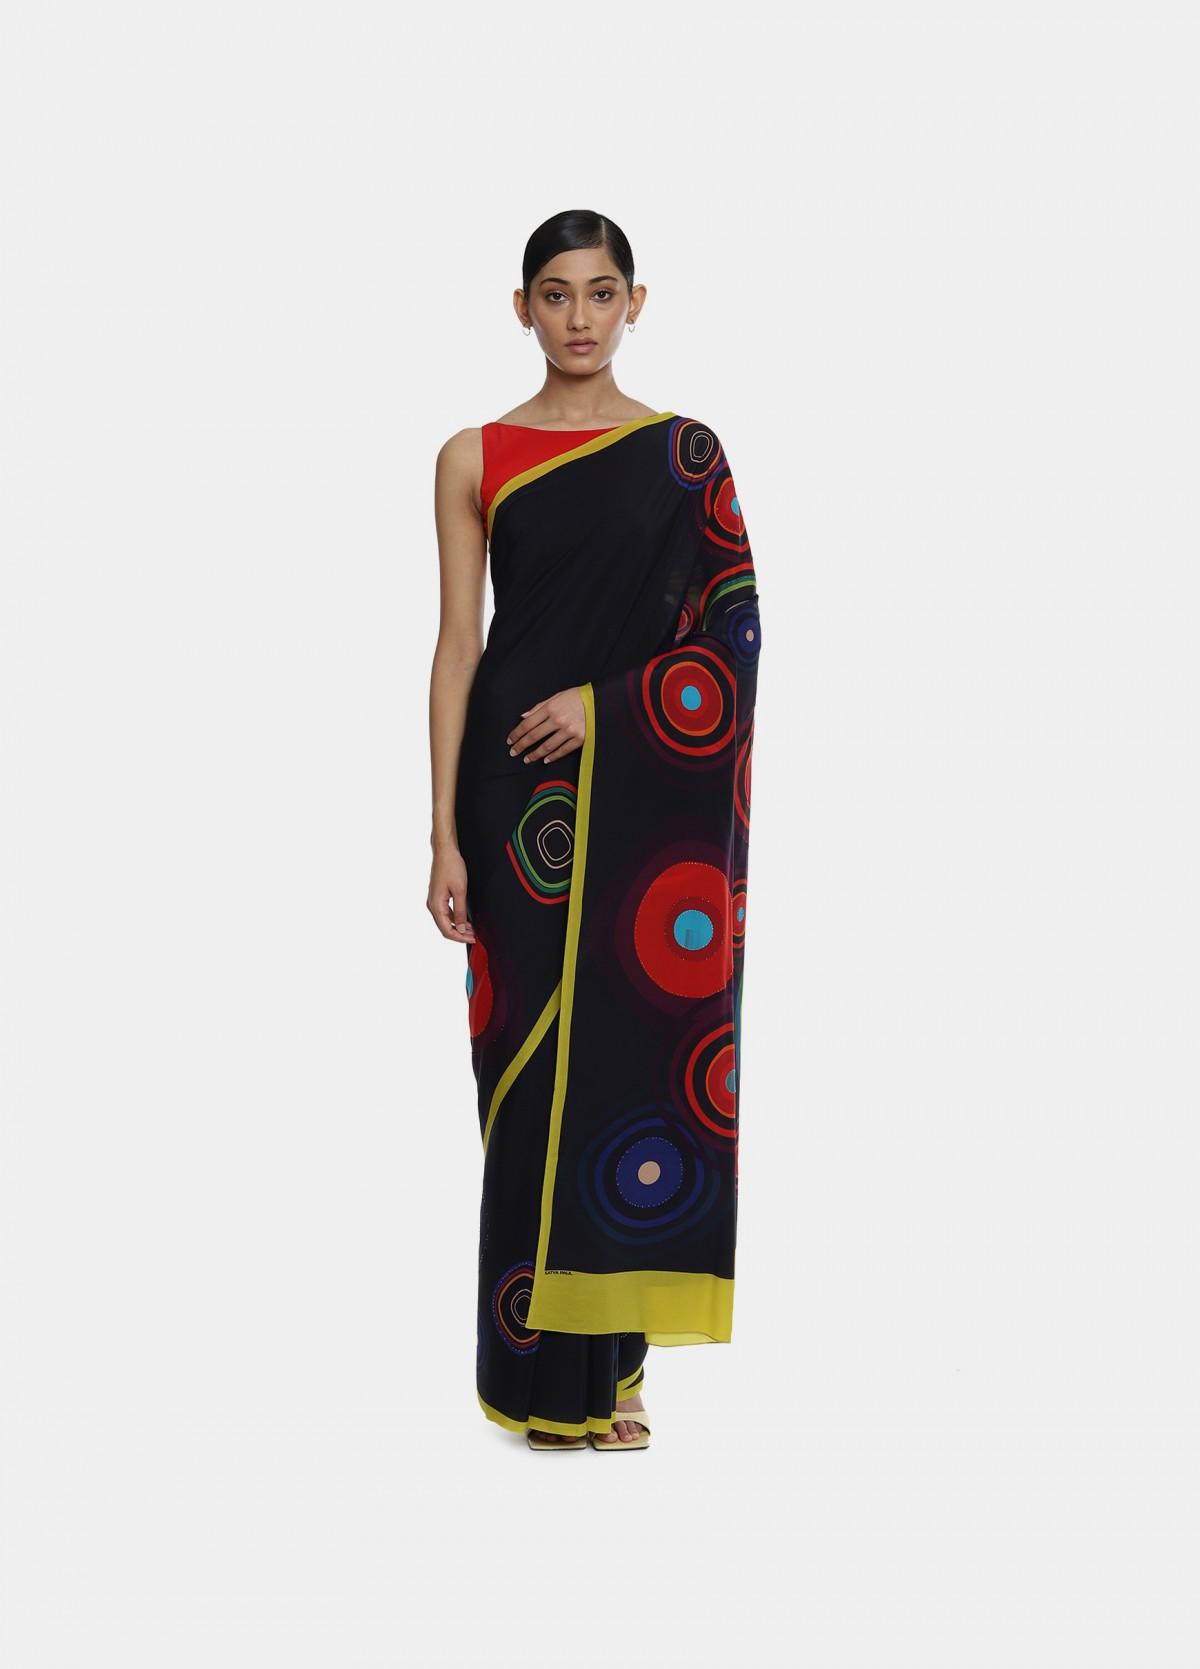 The Vivadelic Sari